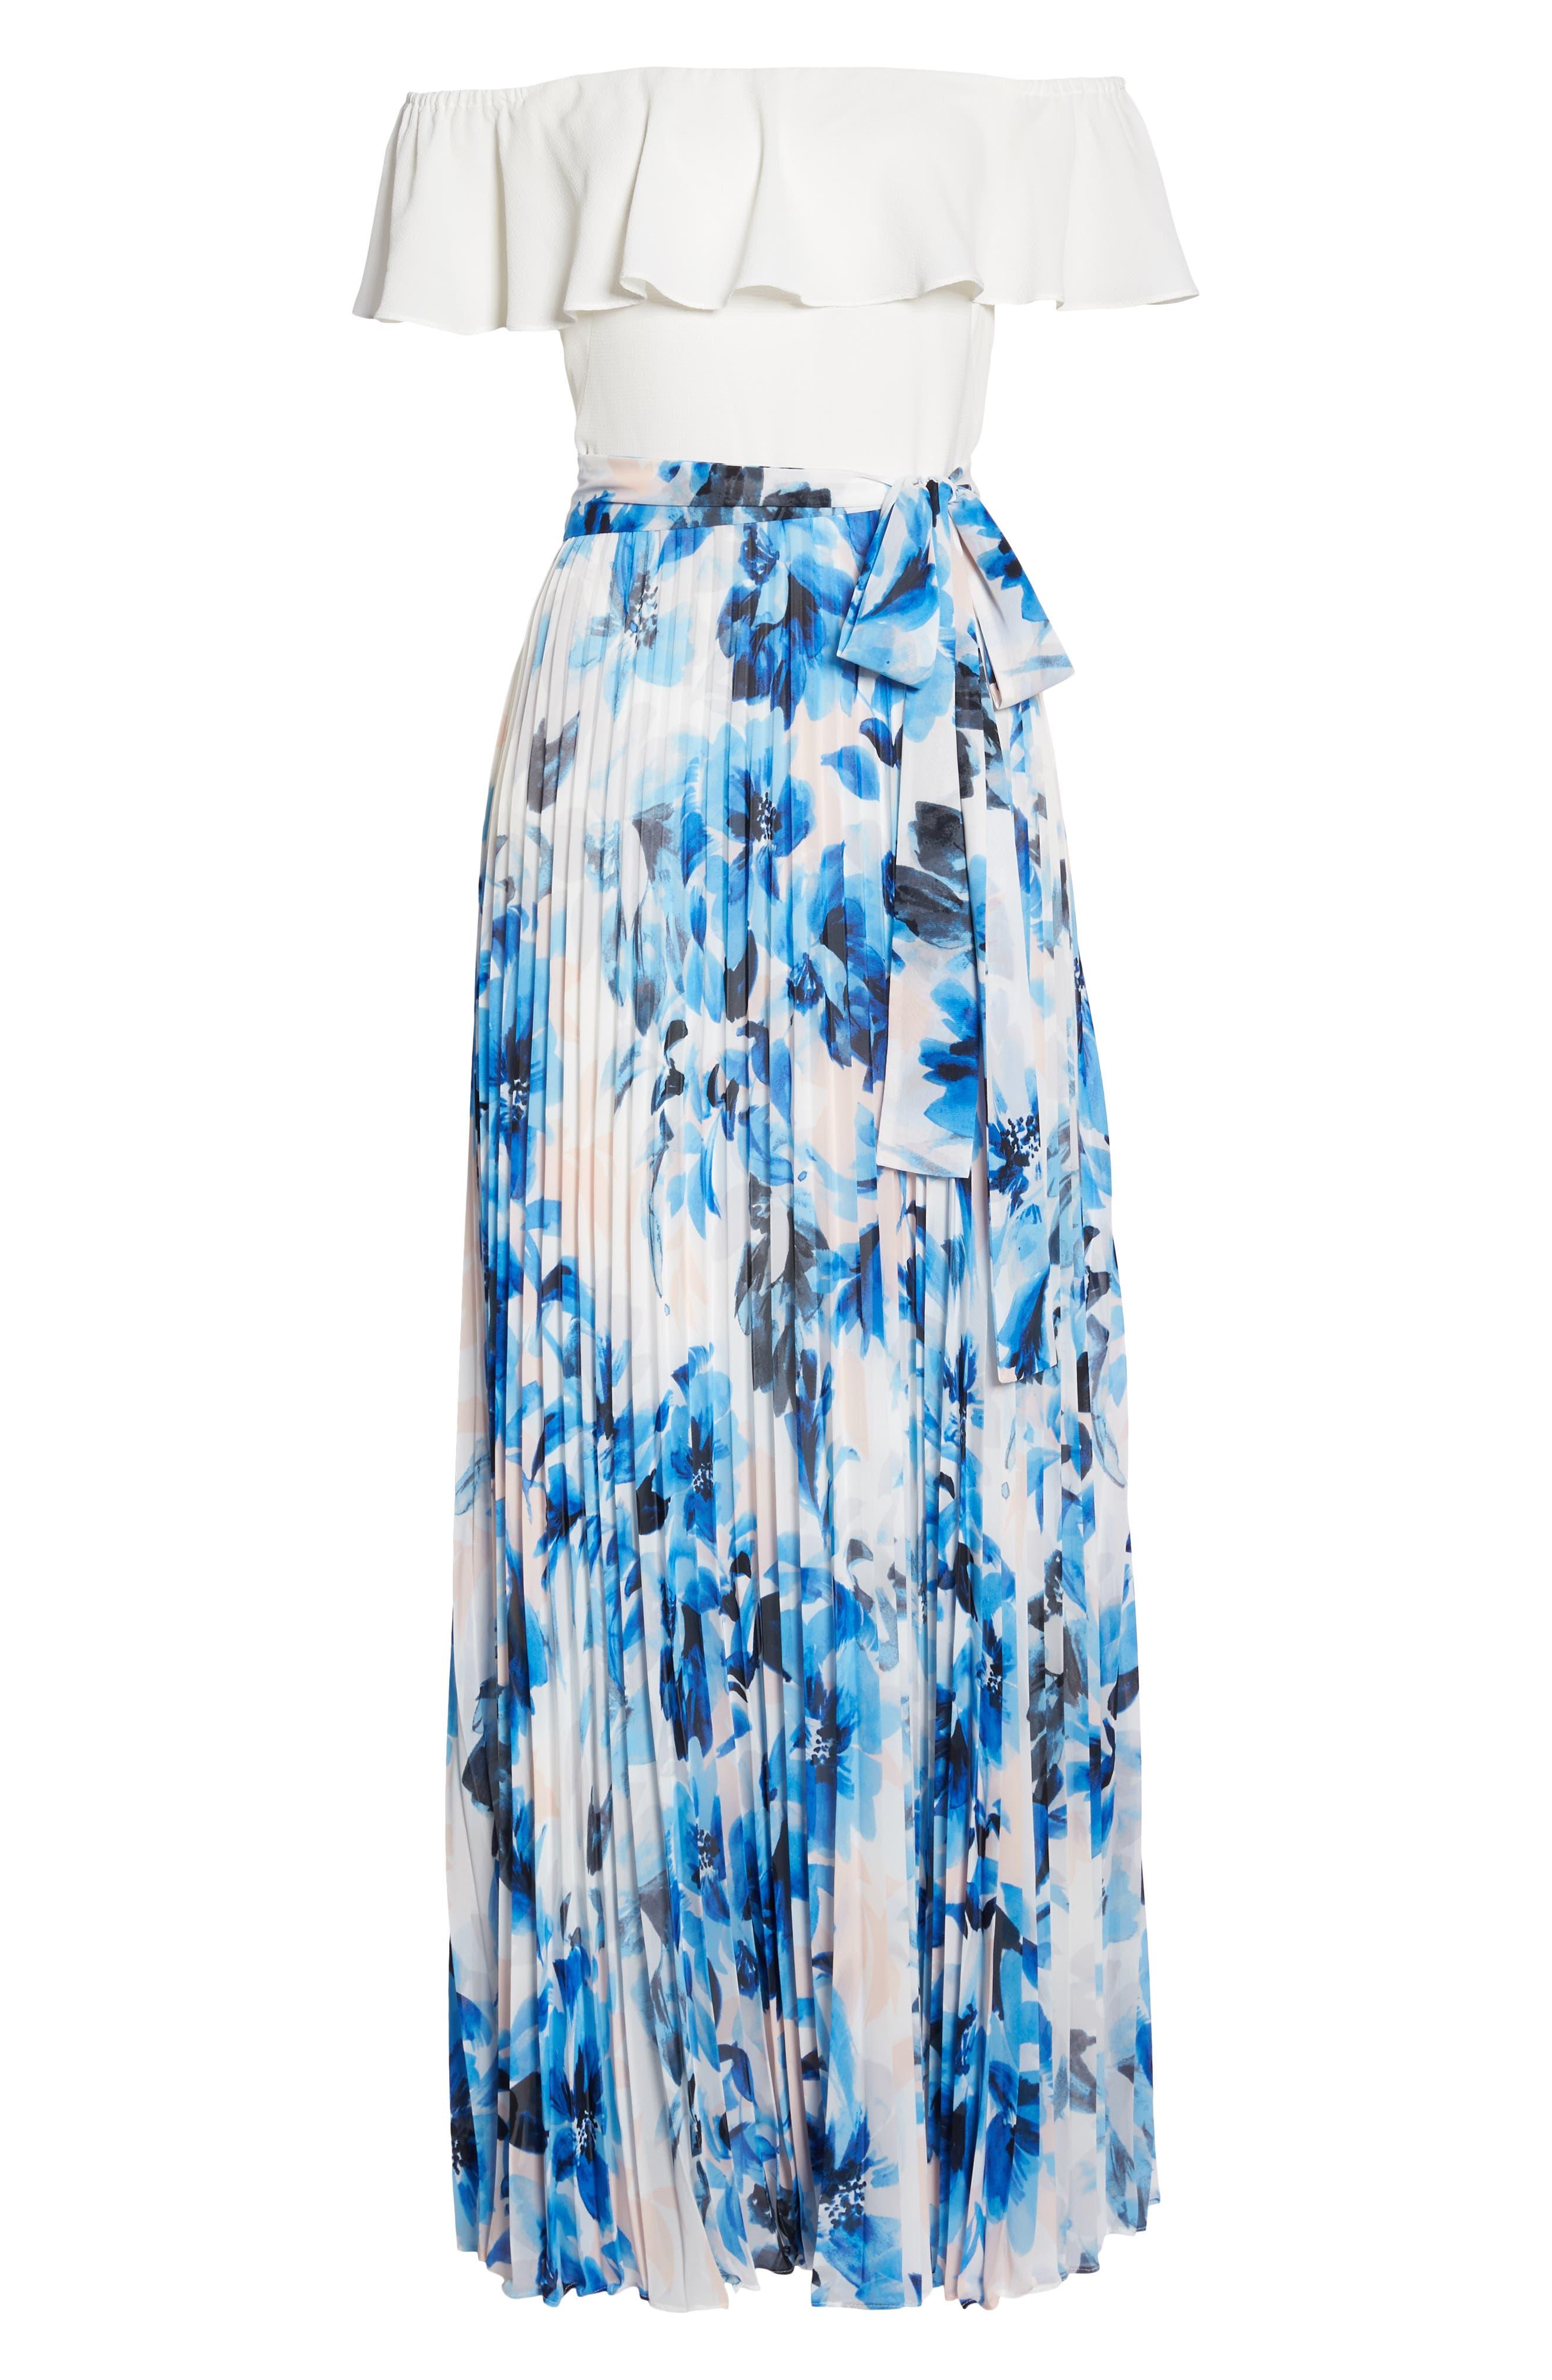 ELIZA J,                             Ruffle Off the Shoulder Maxi Dress,                             Alternate thumbnail 7, color,                             421